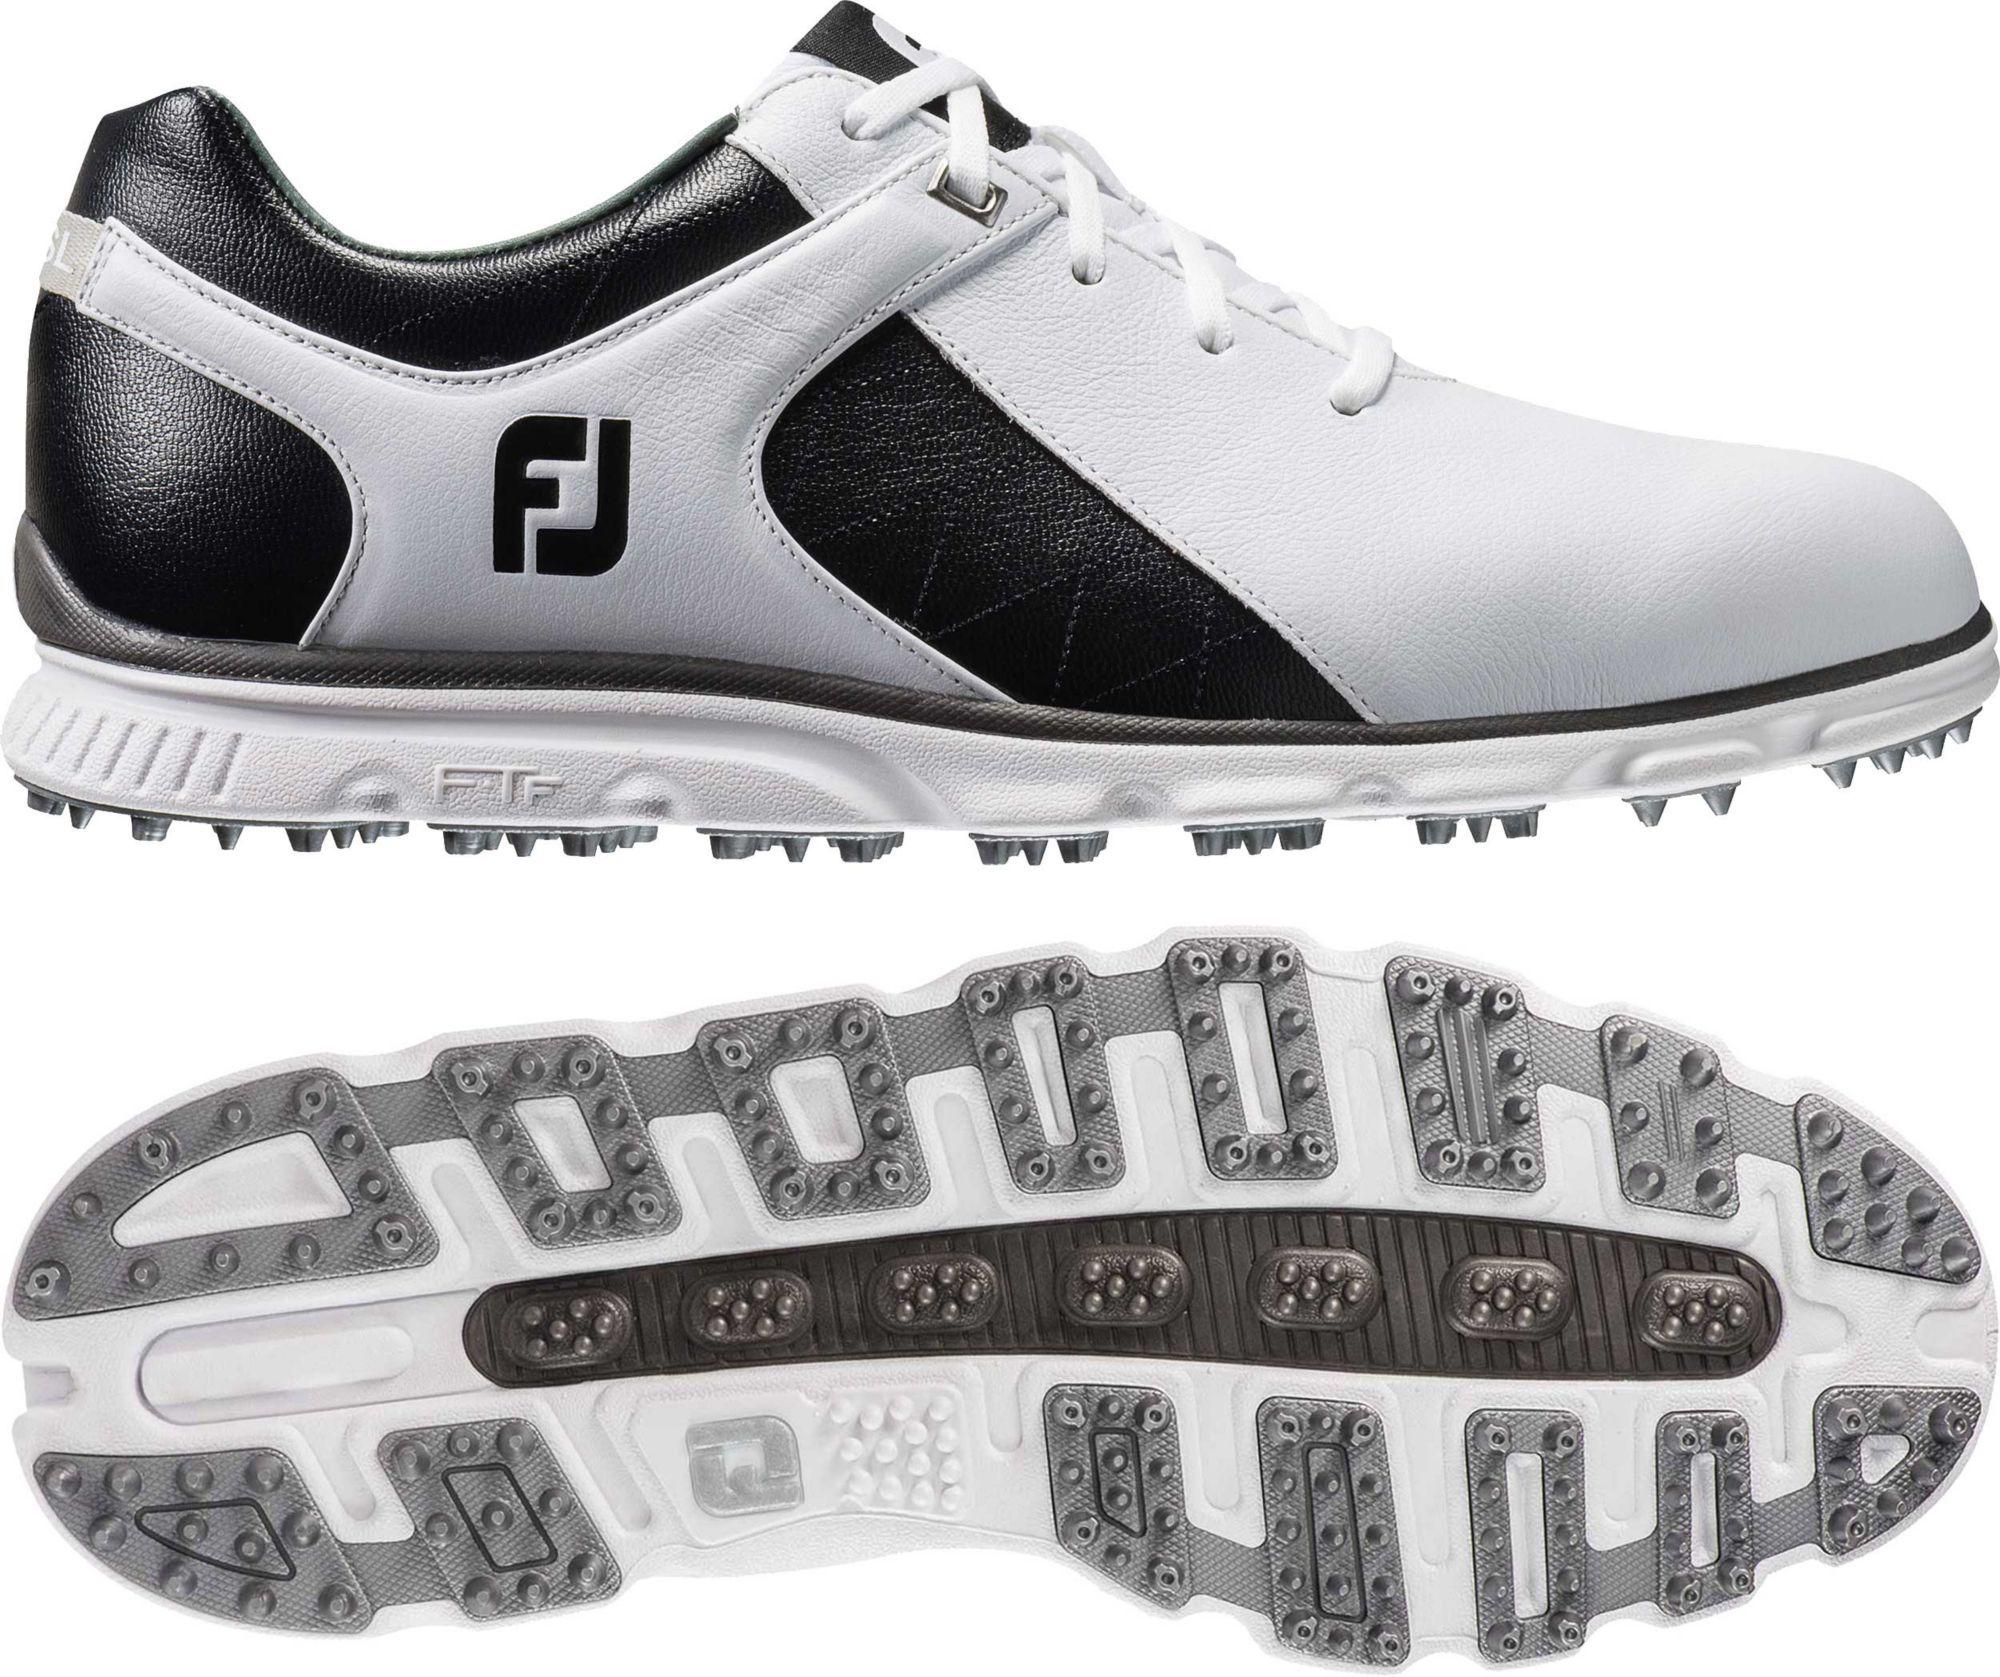 9fe954795925 FootJoy Men s Pro SL Golf Shoes (Previous Season Style) in 2019 ...